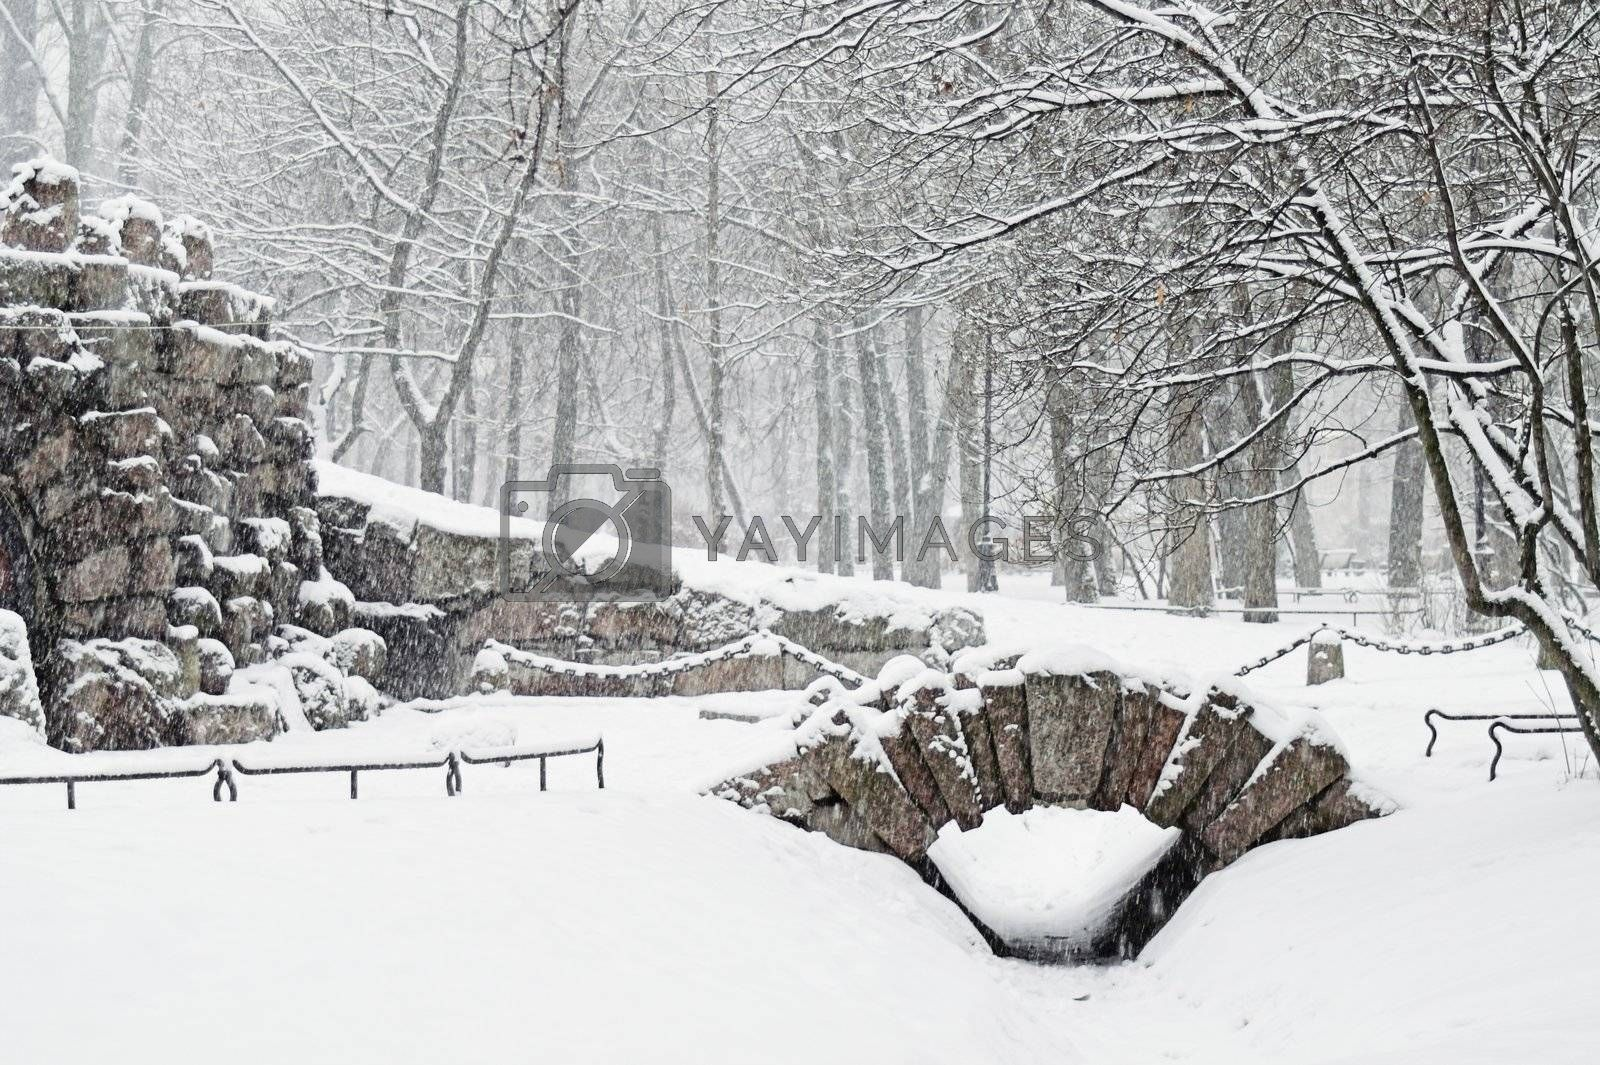 Grotto in city park at snowfall